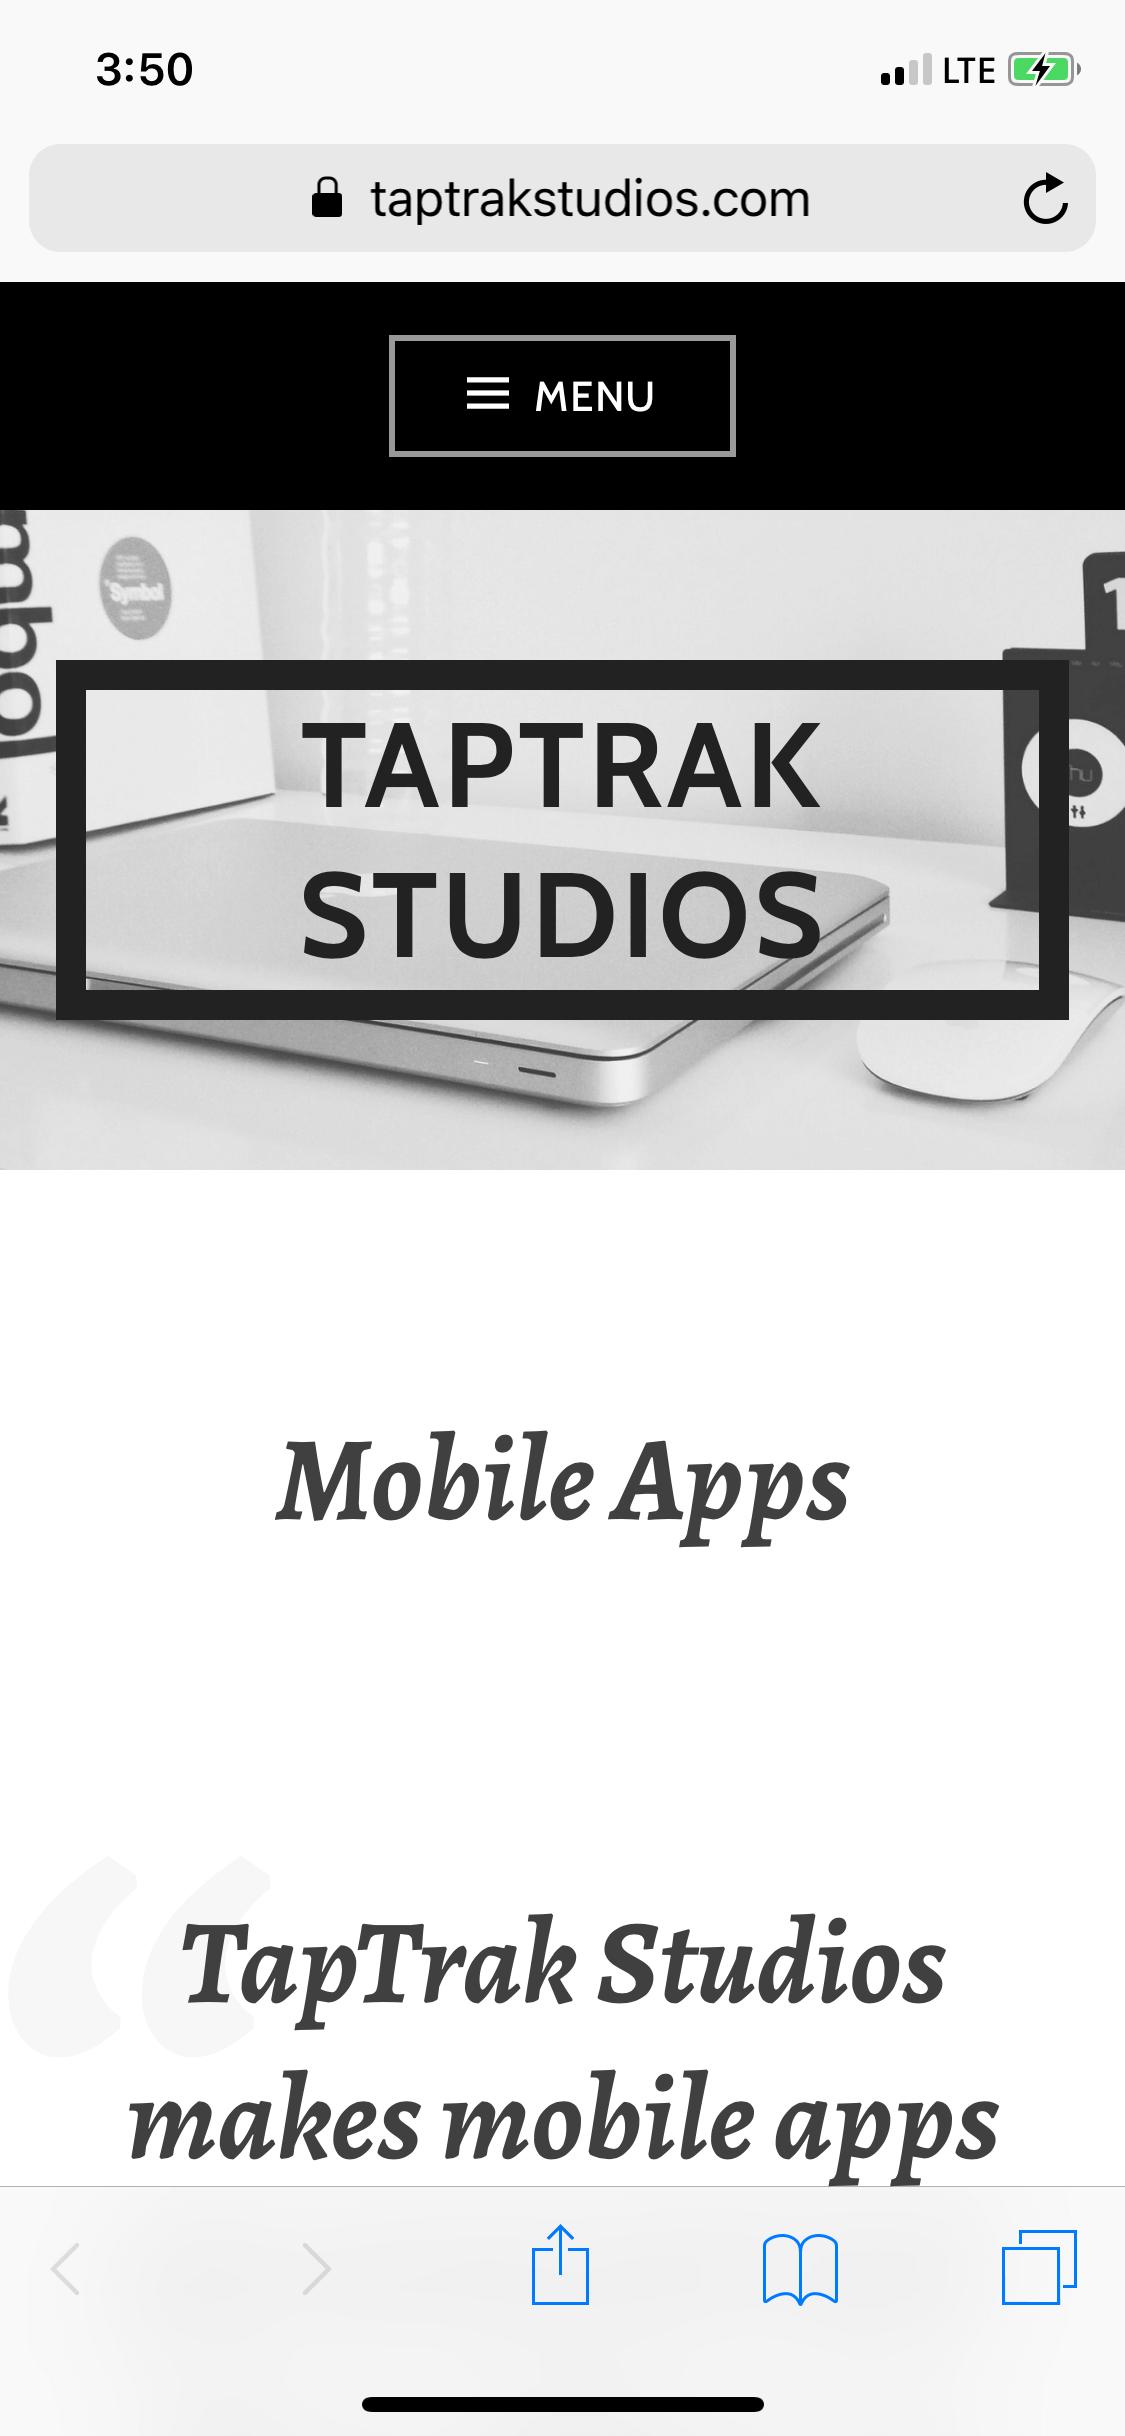 TapTrakStudios.com